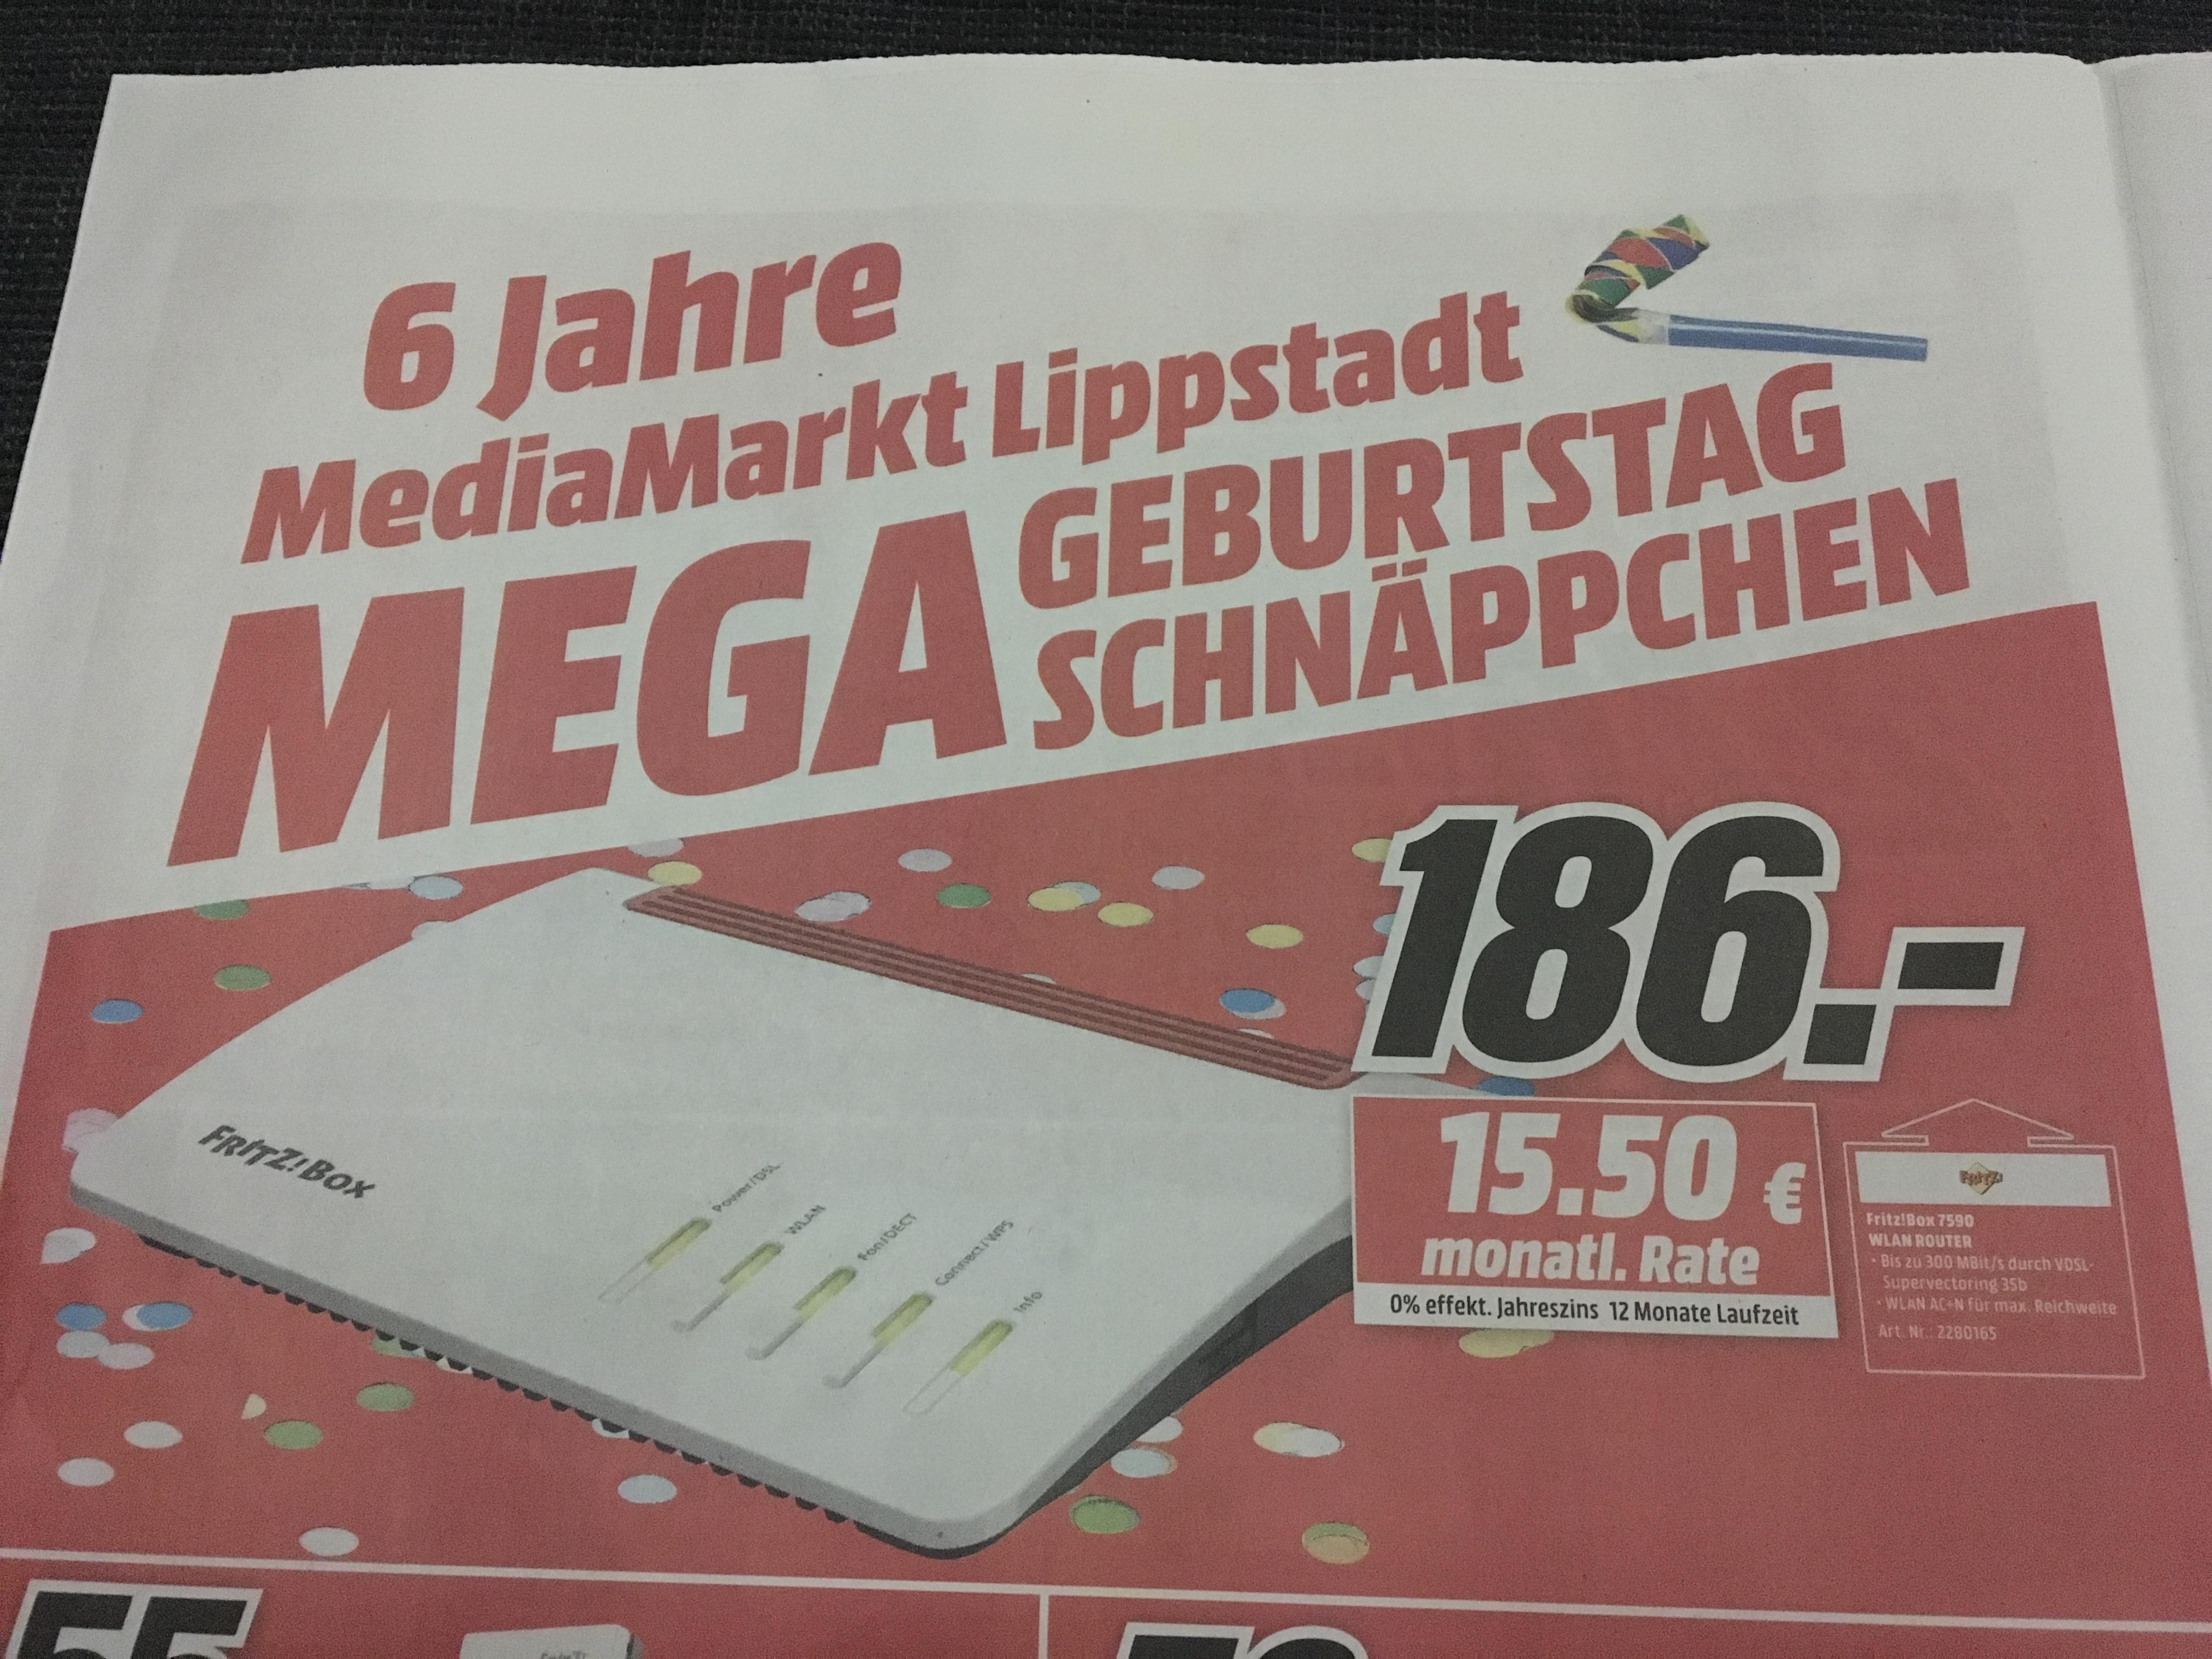 Lokal MM Lippstadt Fritz!Box 7590